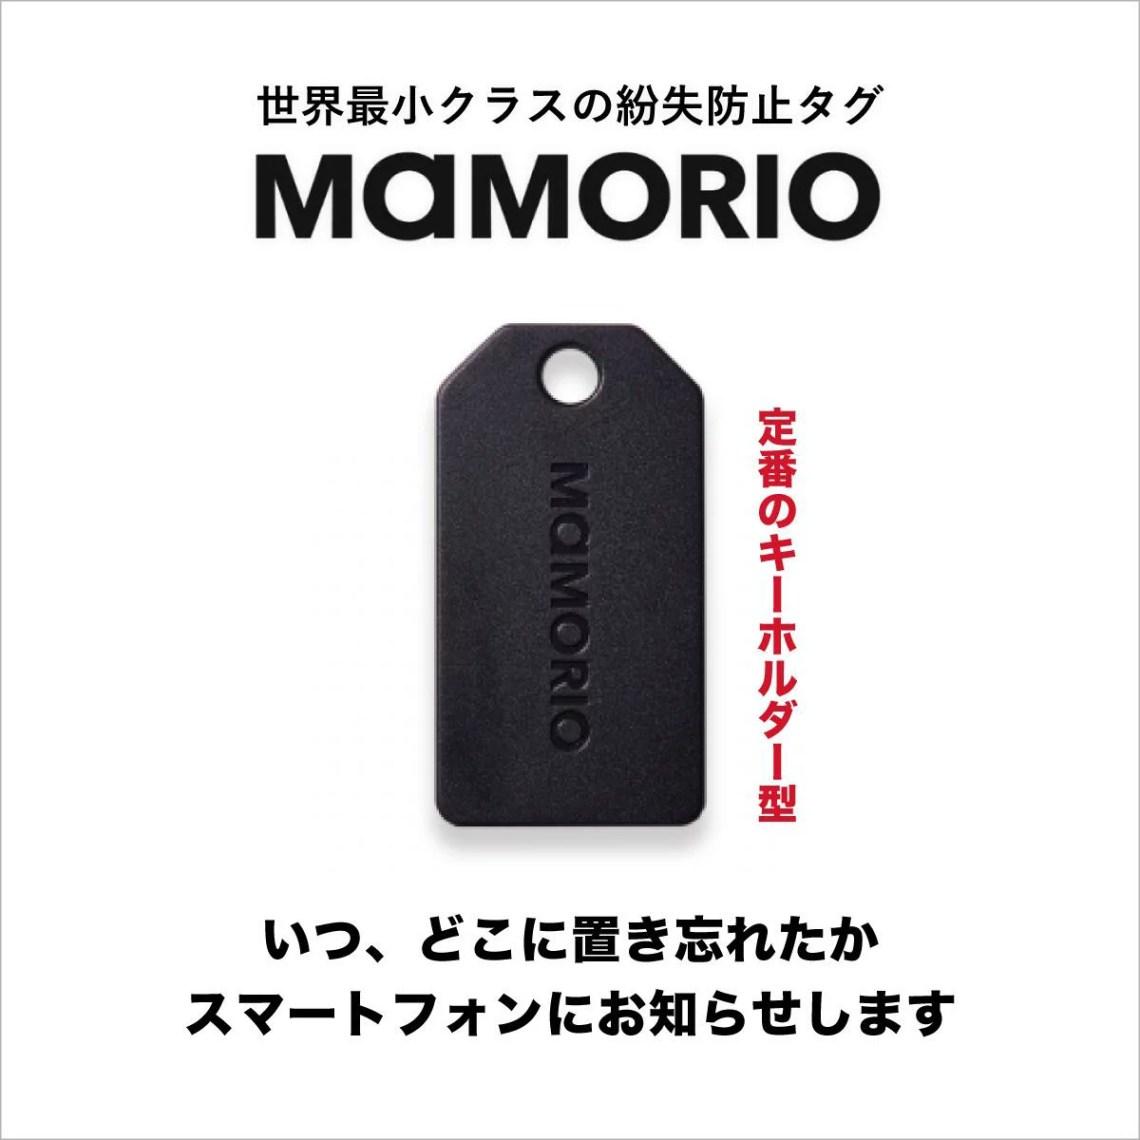 MAMORIO マモリオ 最新モデル 世界最小級の紛失防止タ